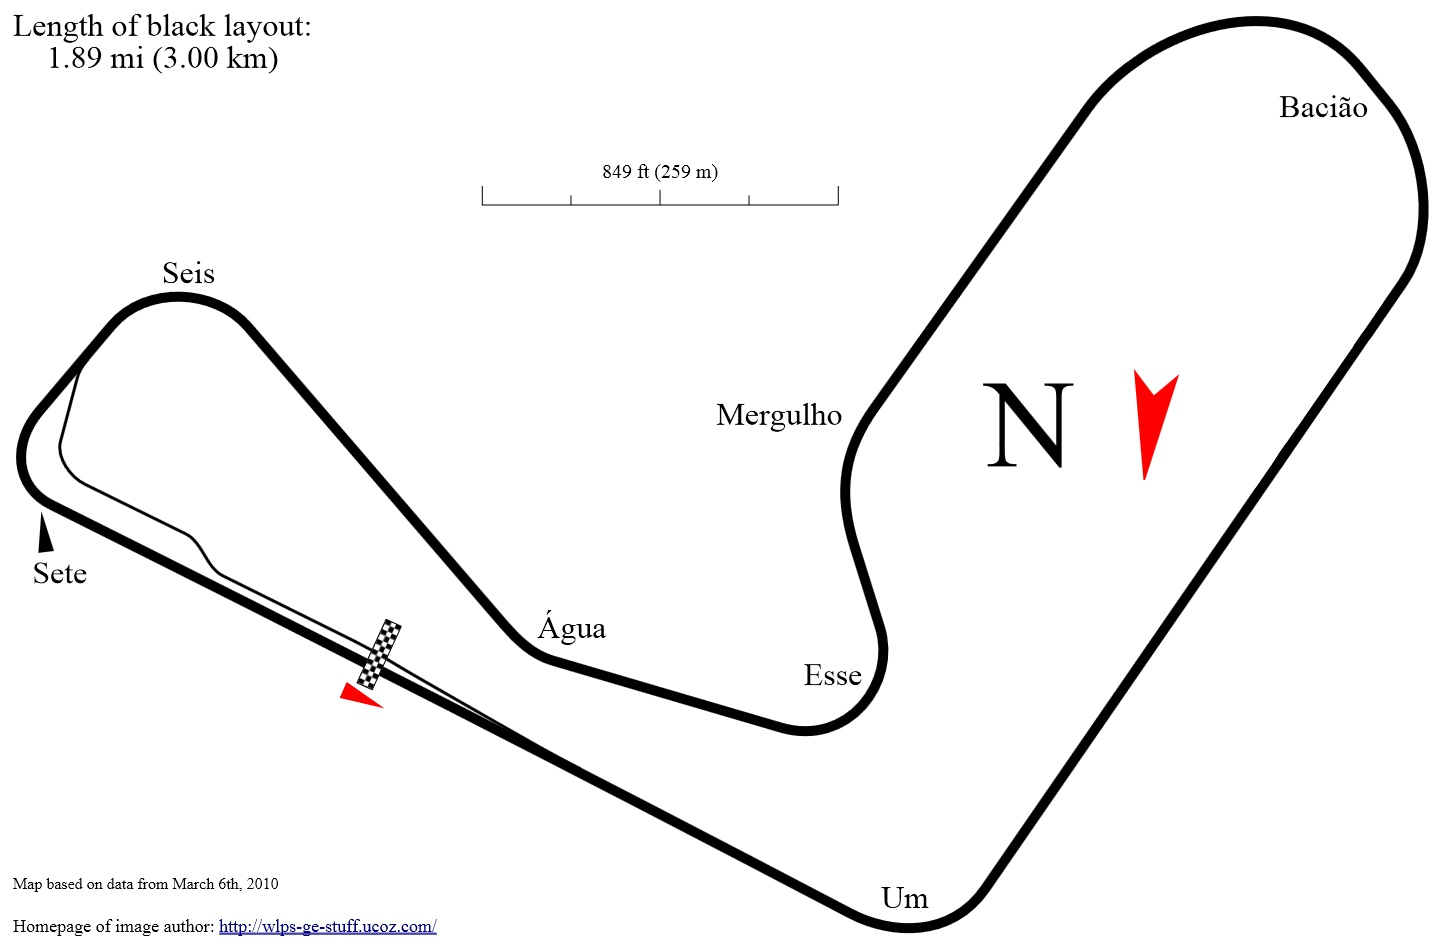 Internacional_de_Cascavel_(Brazil)_track_map